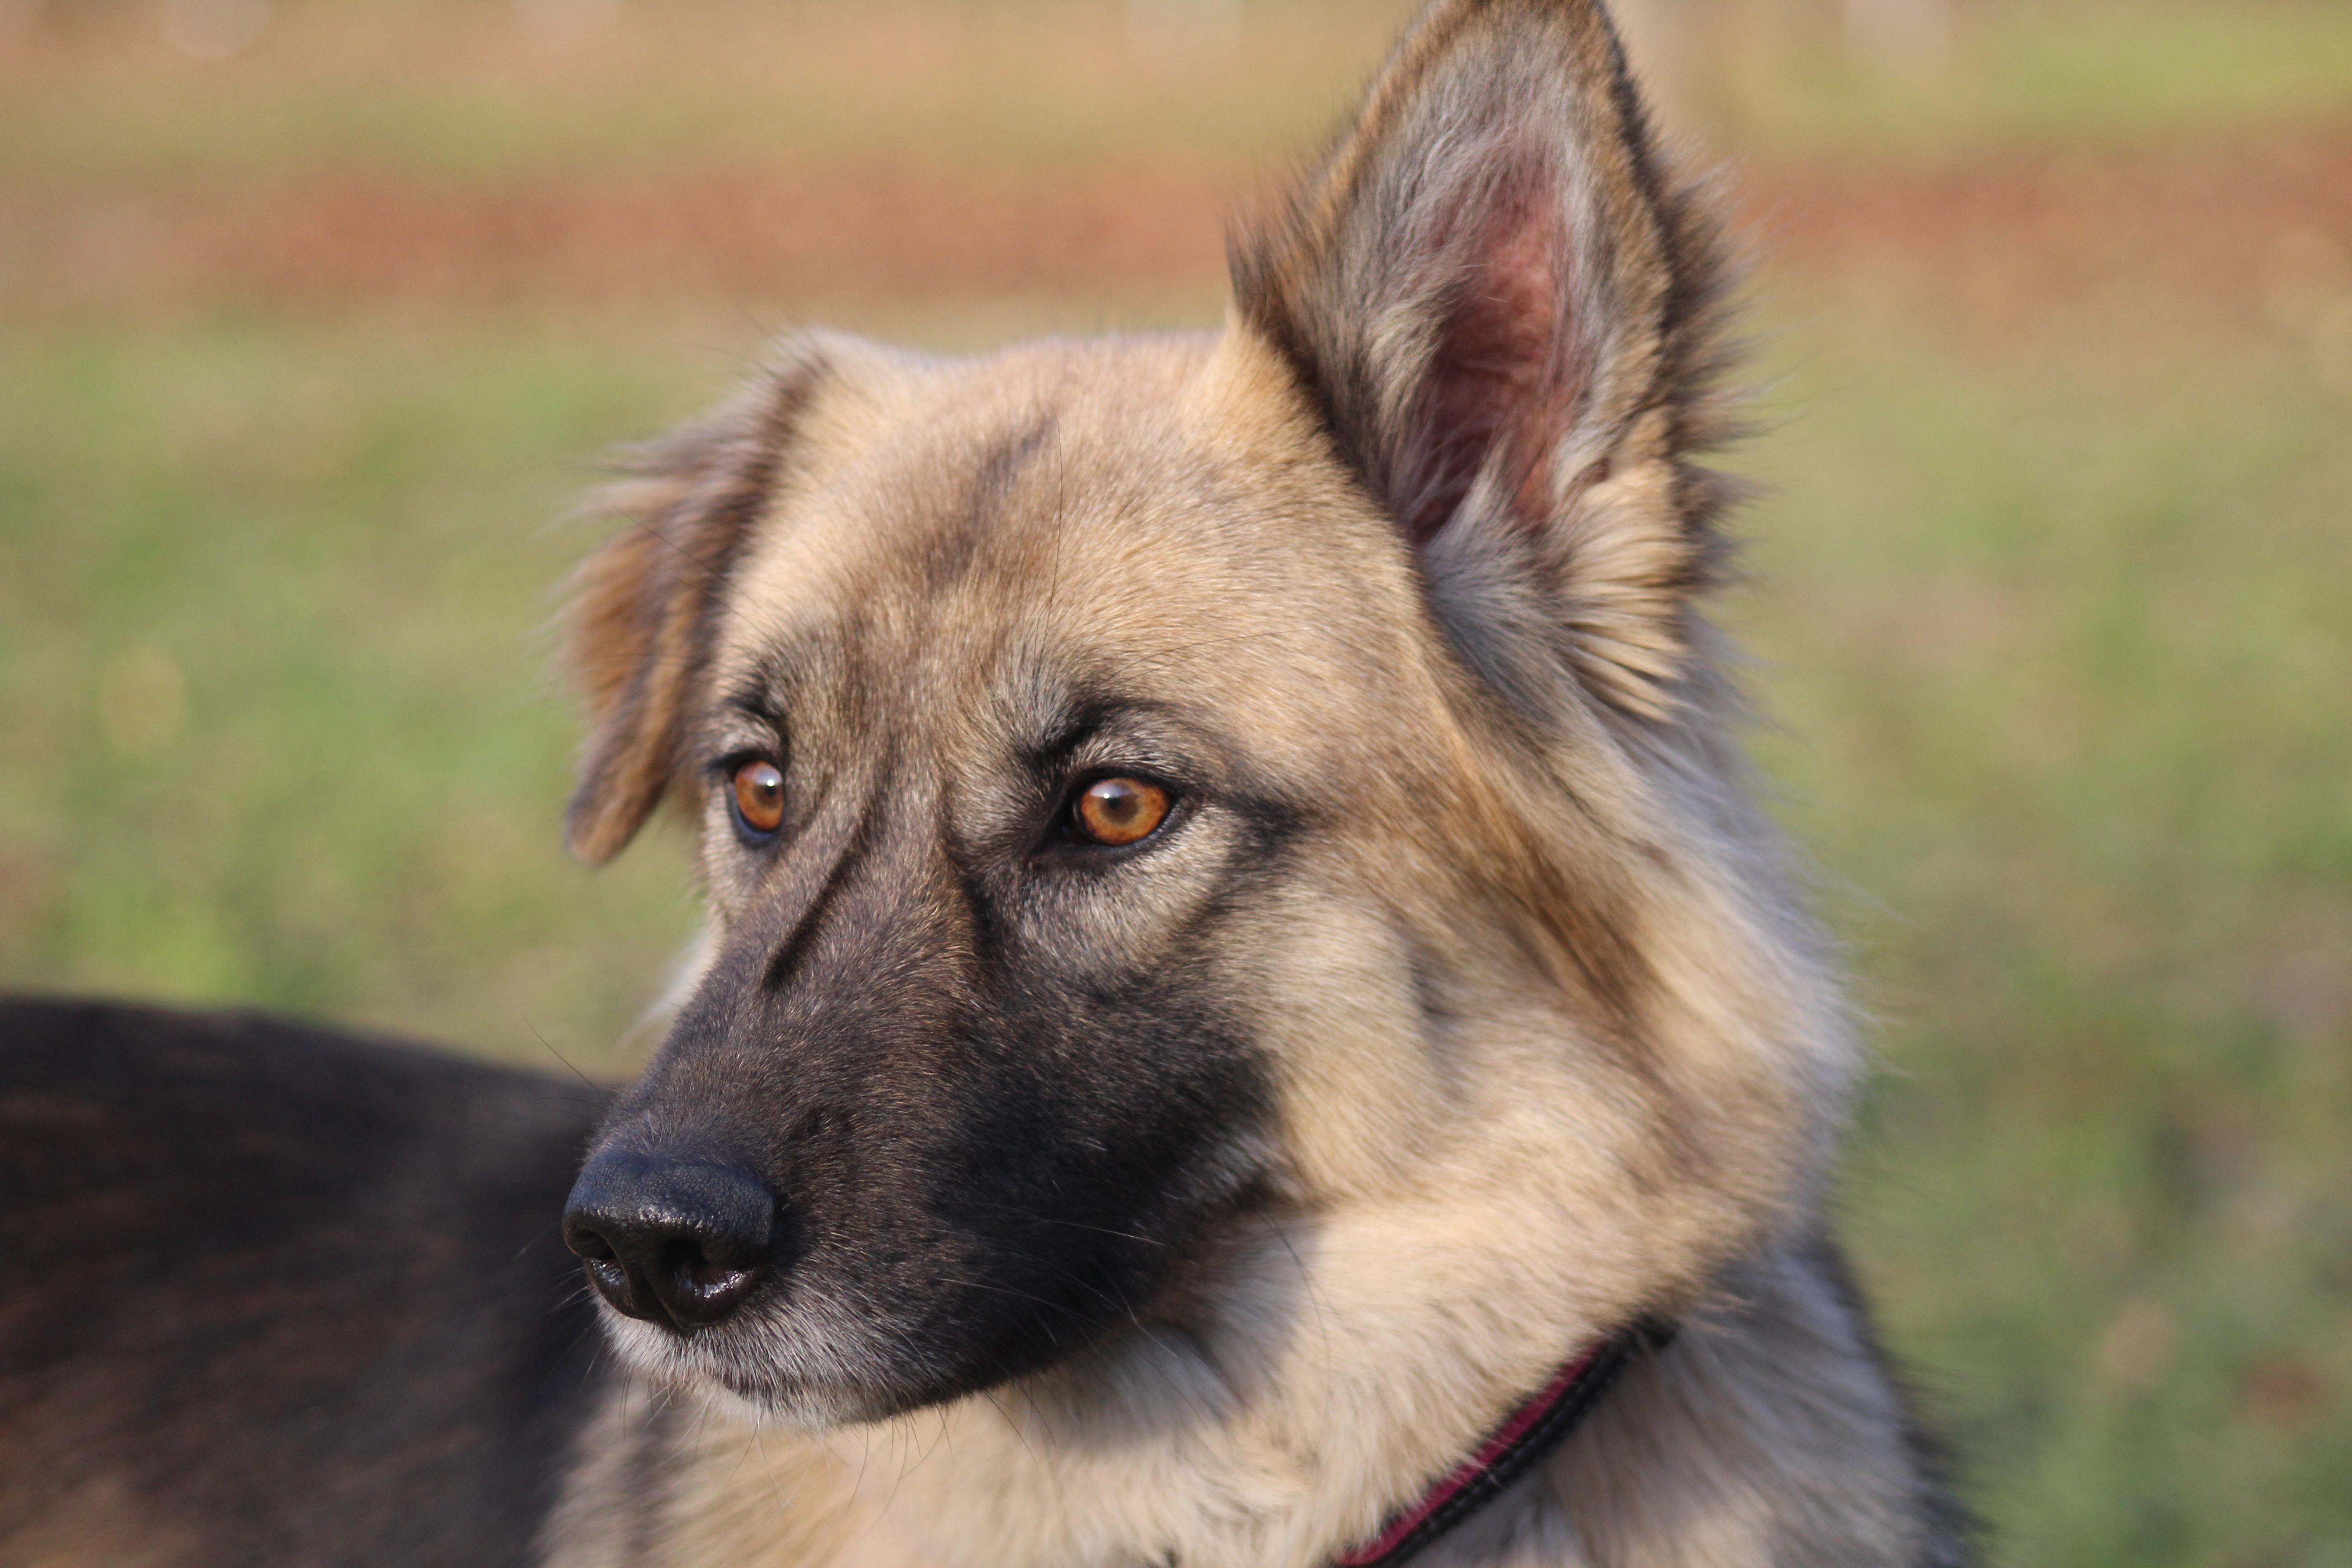 Murmel (Chow-Chow - Mischling, 5 Jahre 6 Monate) - Hunde ...  Murmel (Chow-Ch...